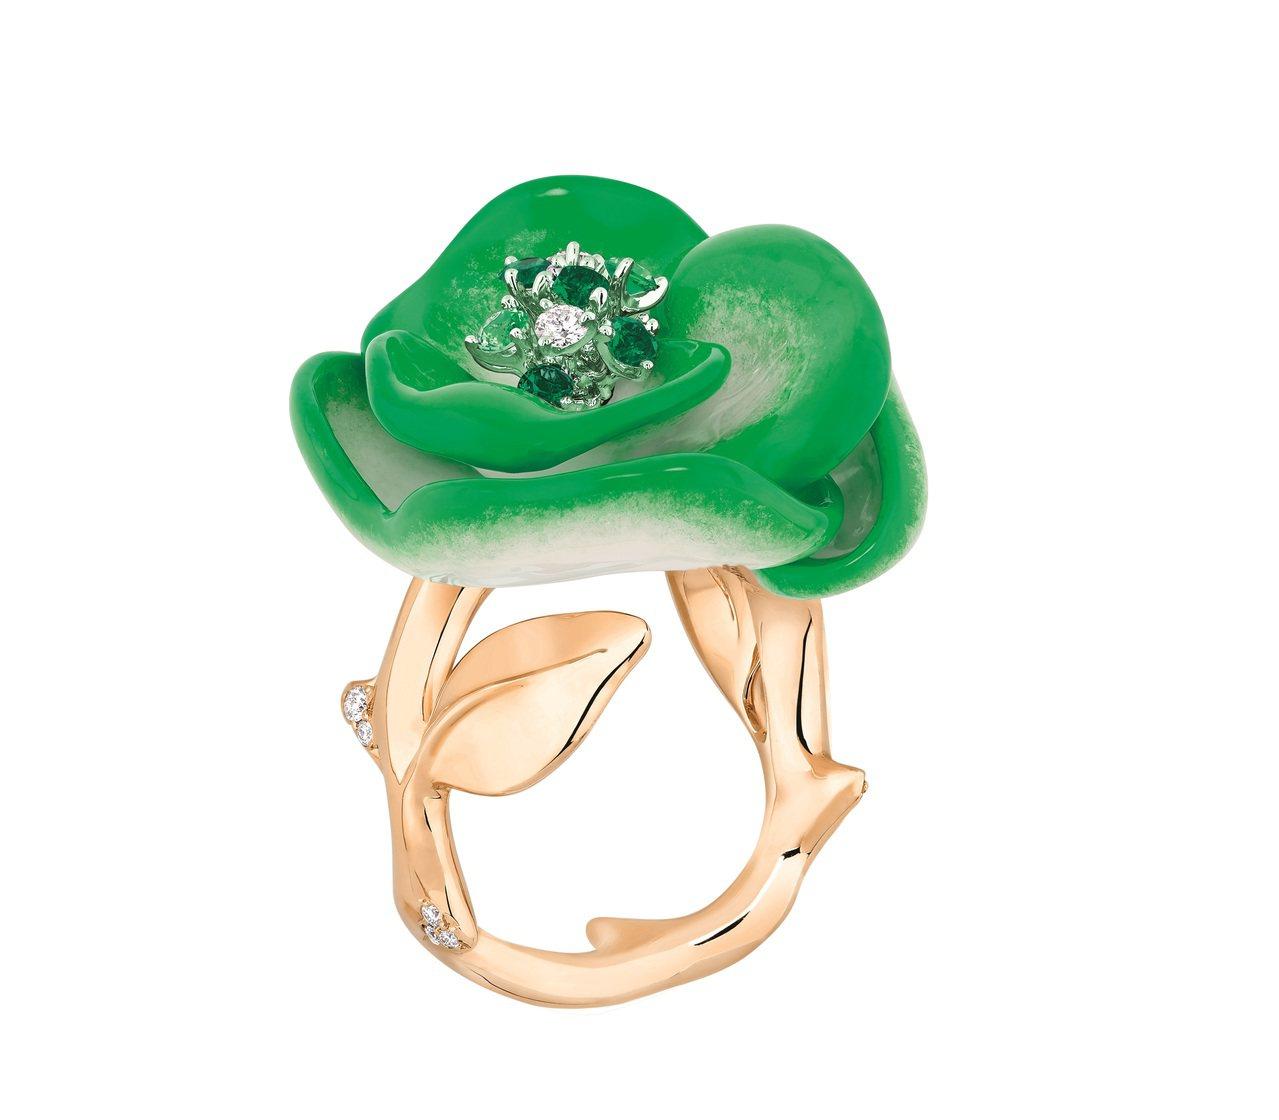 Rose Dior Pop系列祖母綠沙弗萊石玫瑰戒指,約90萬元。圖/Dior提...